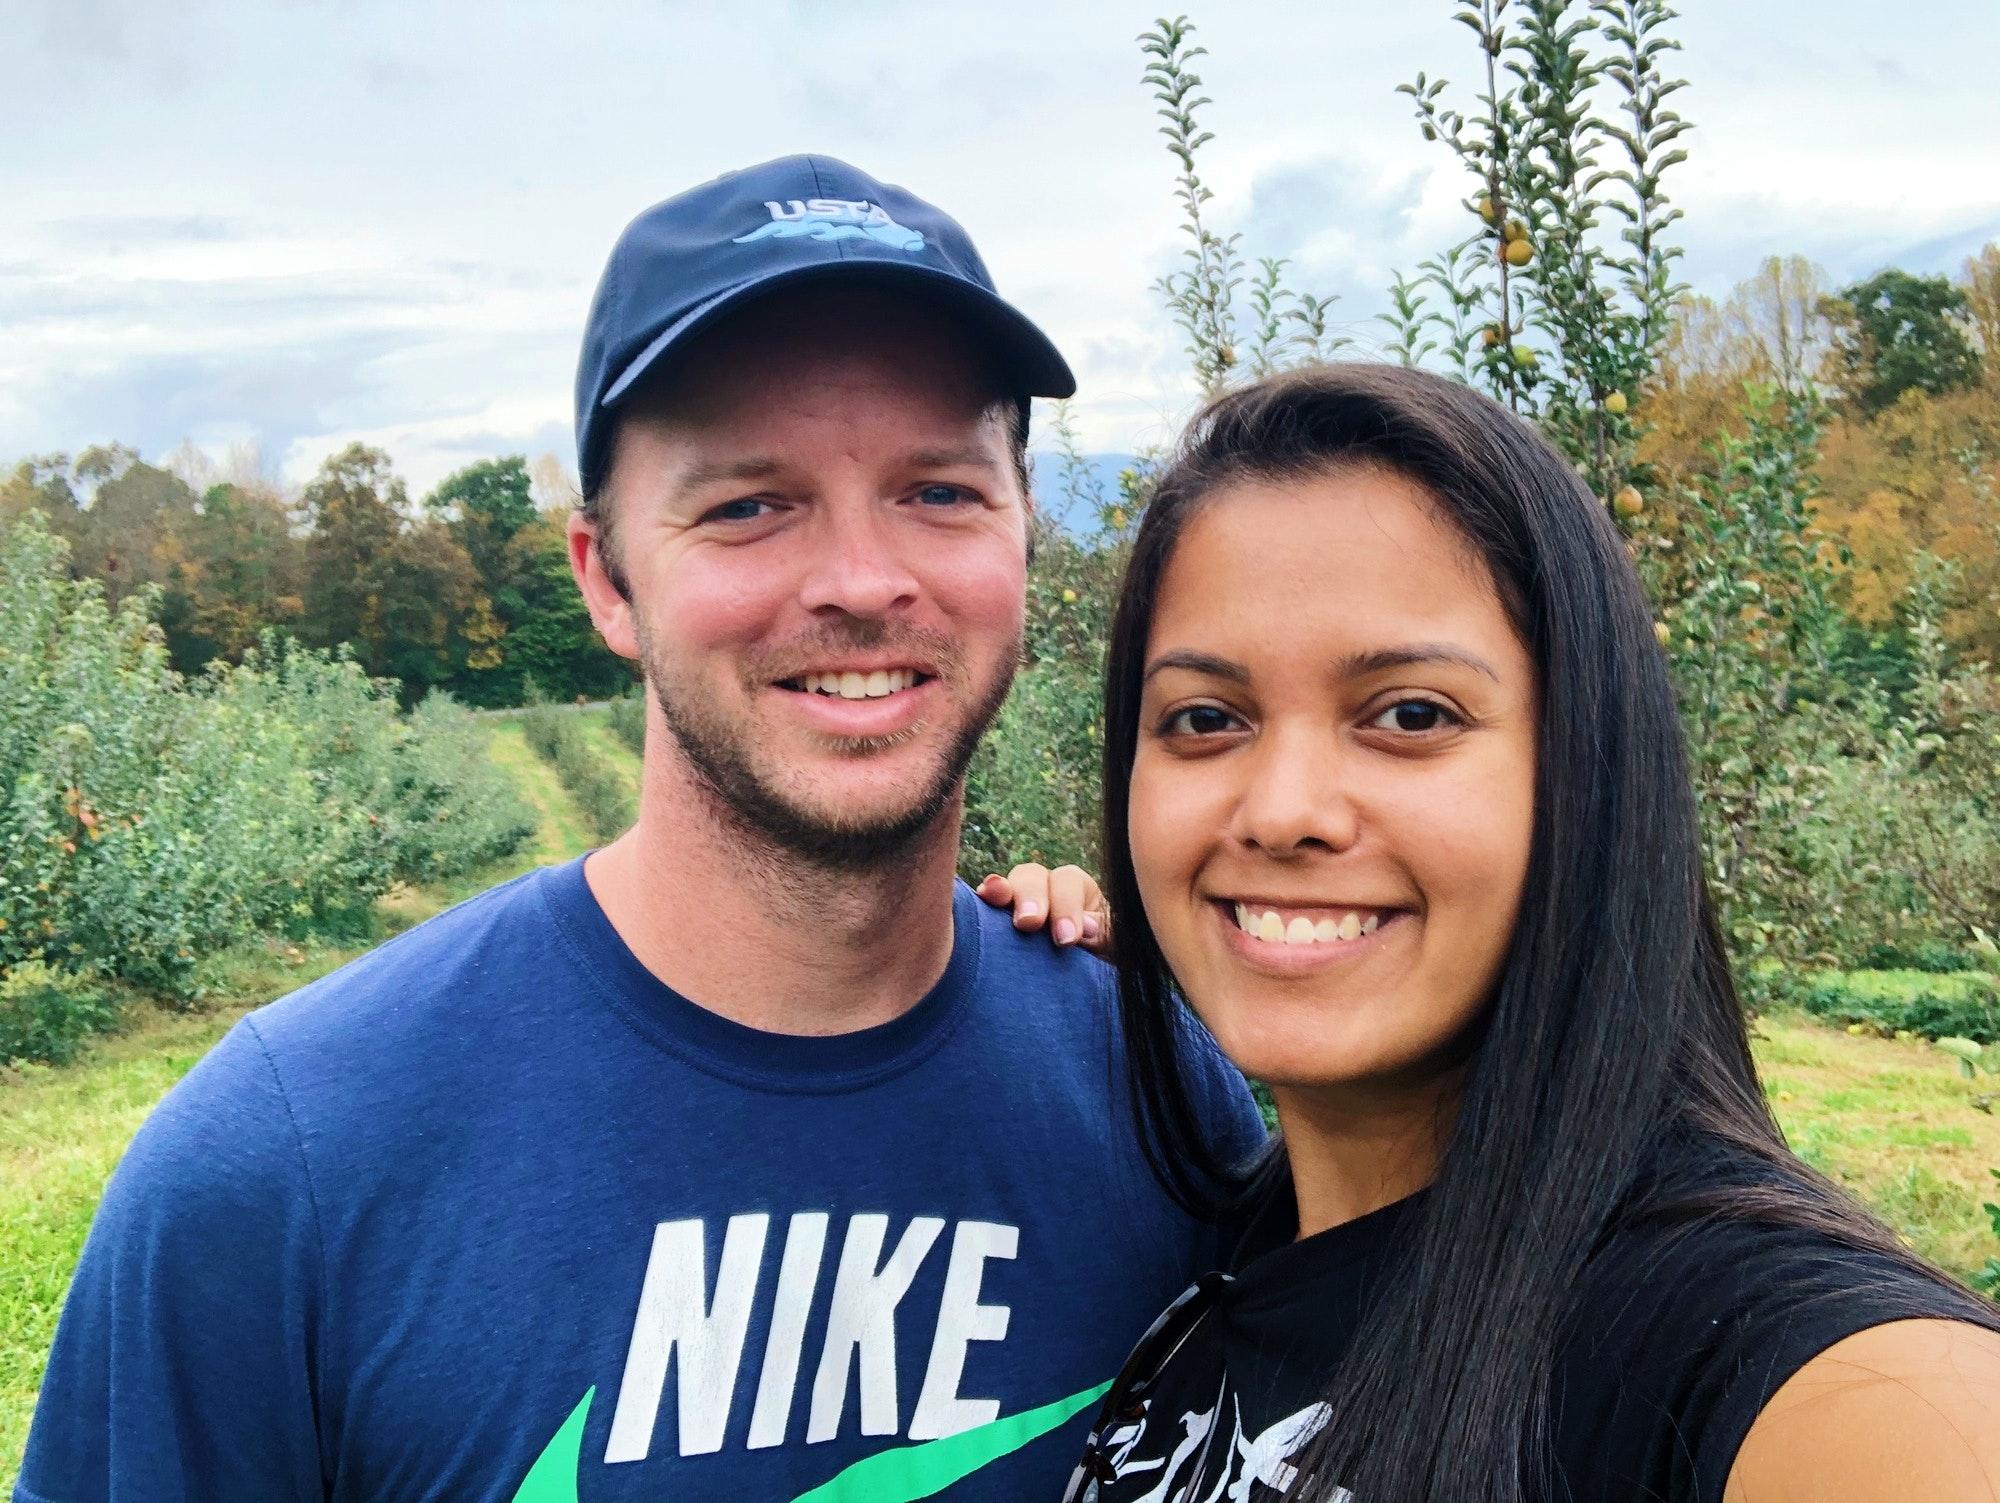 Jeremiah S. teaches tennis lessons in Smyrna, GA